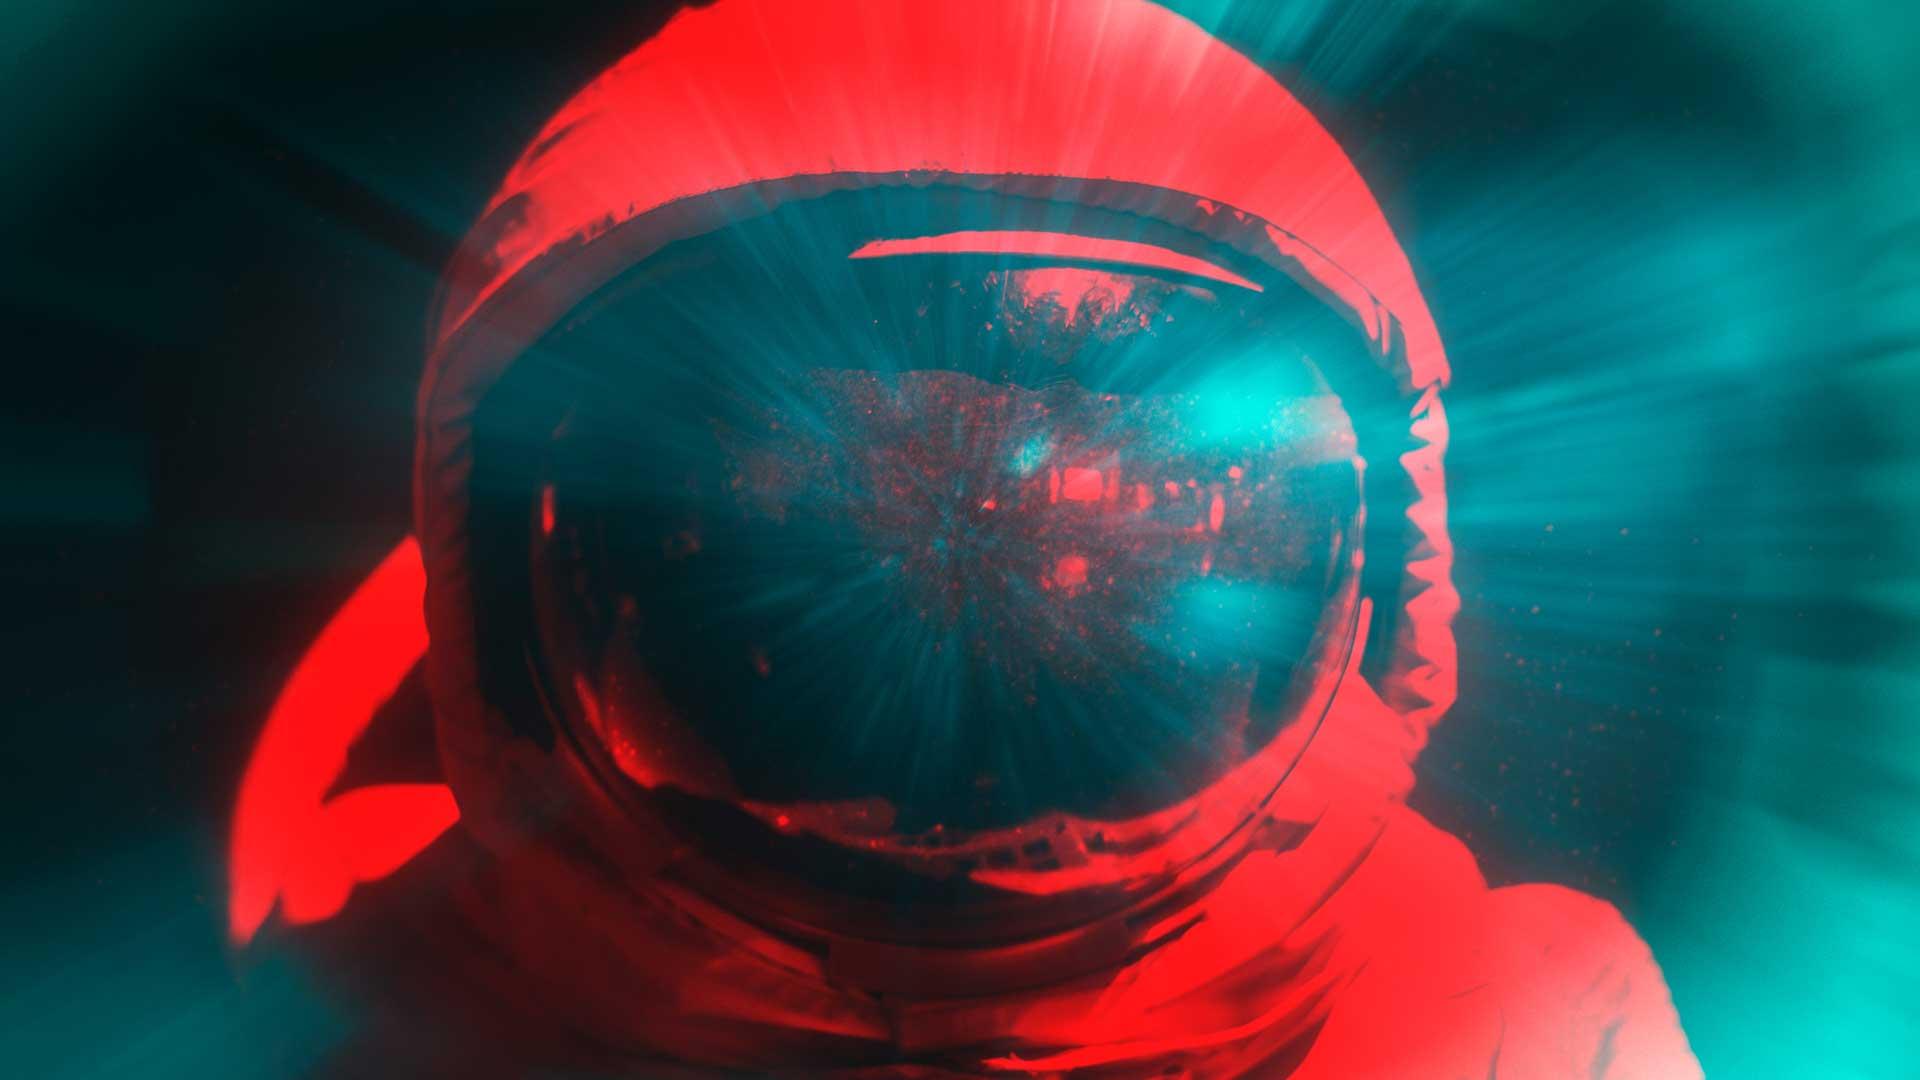 Entprima Jazz Cosmonauts